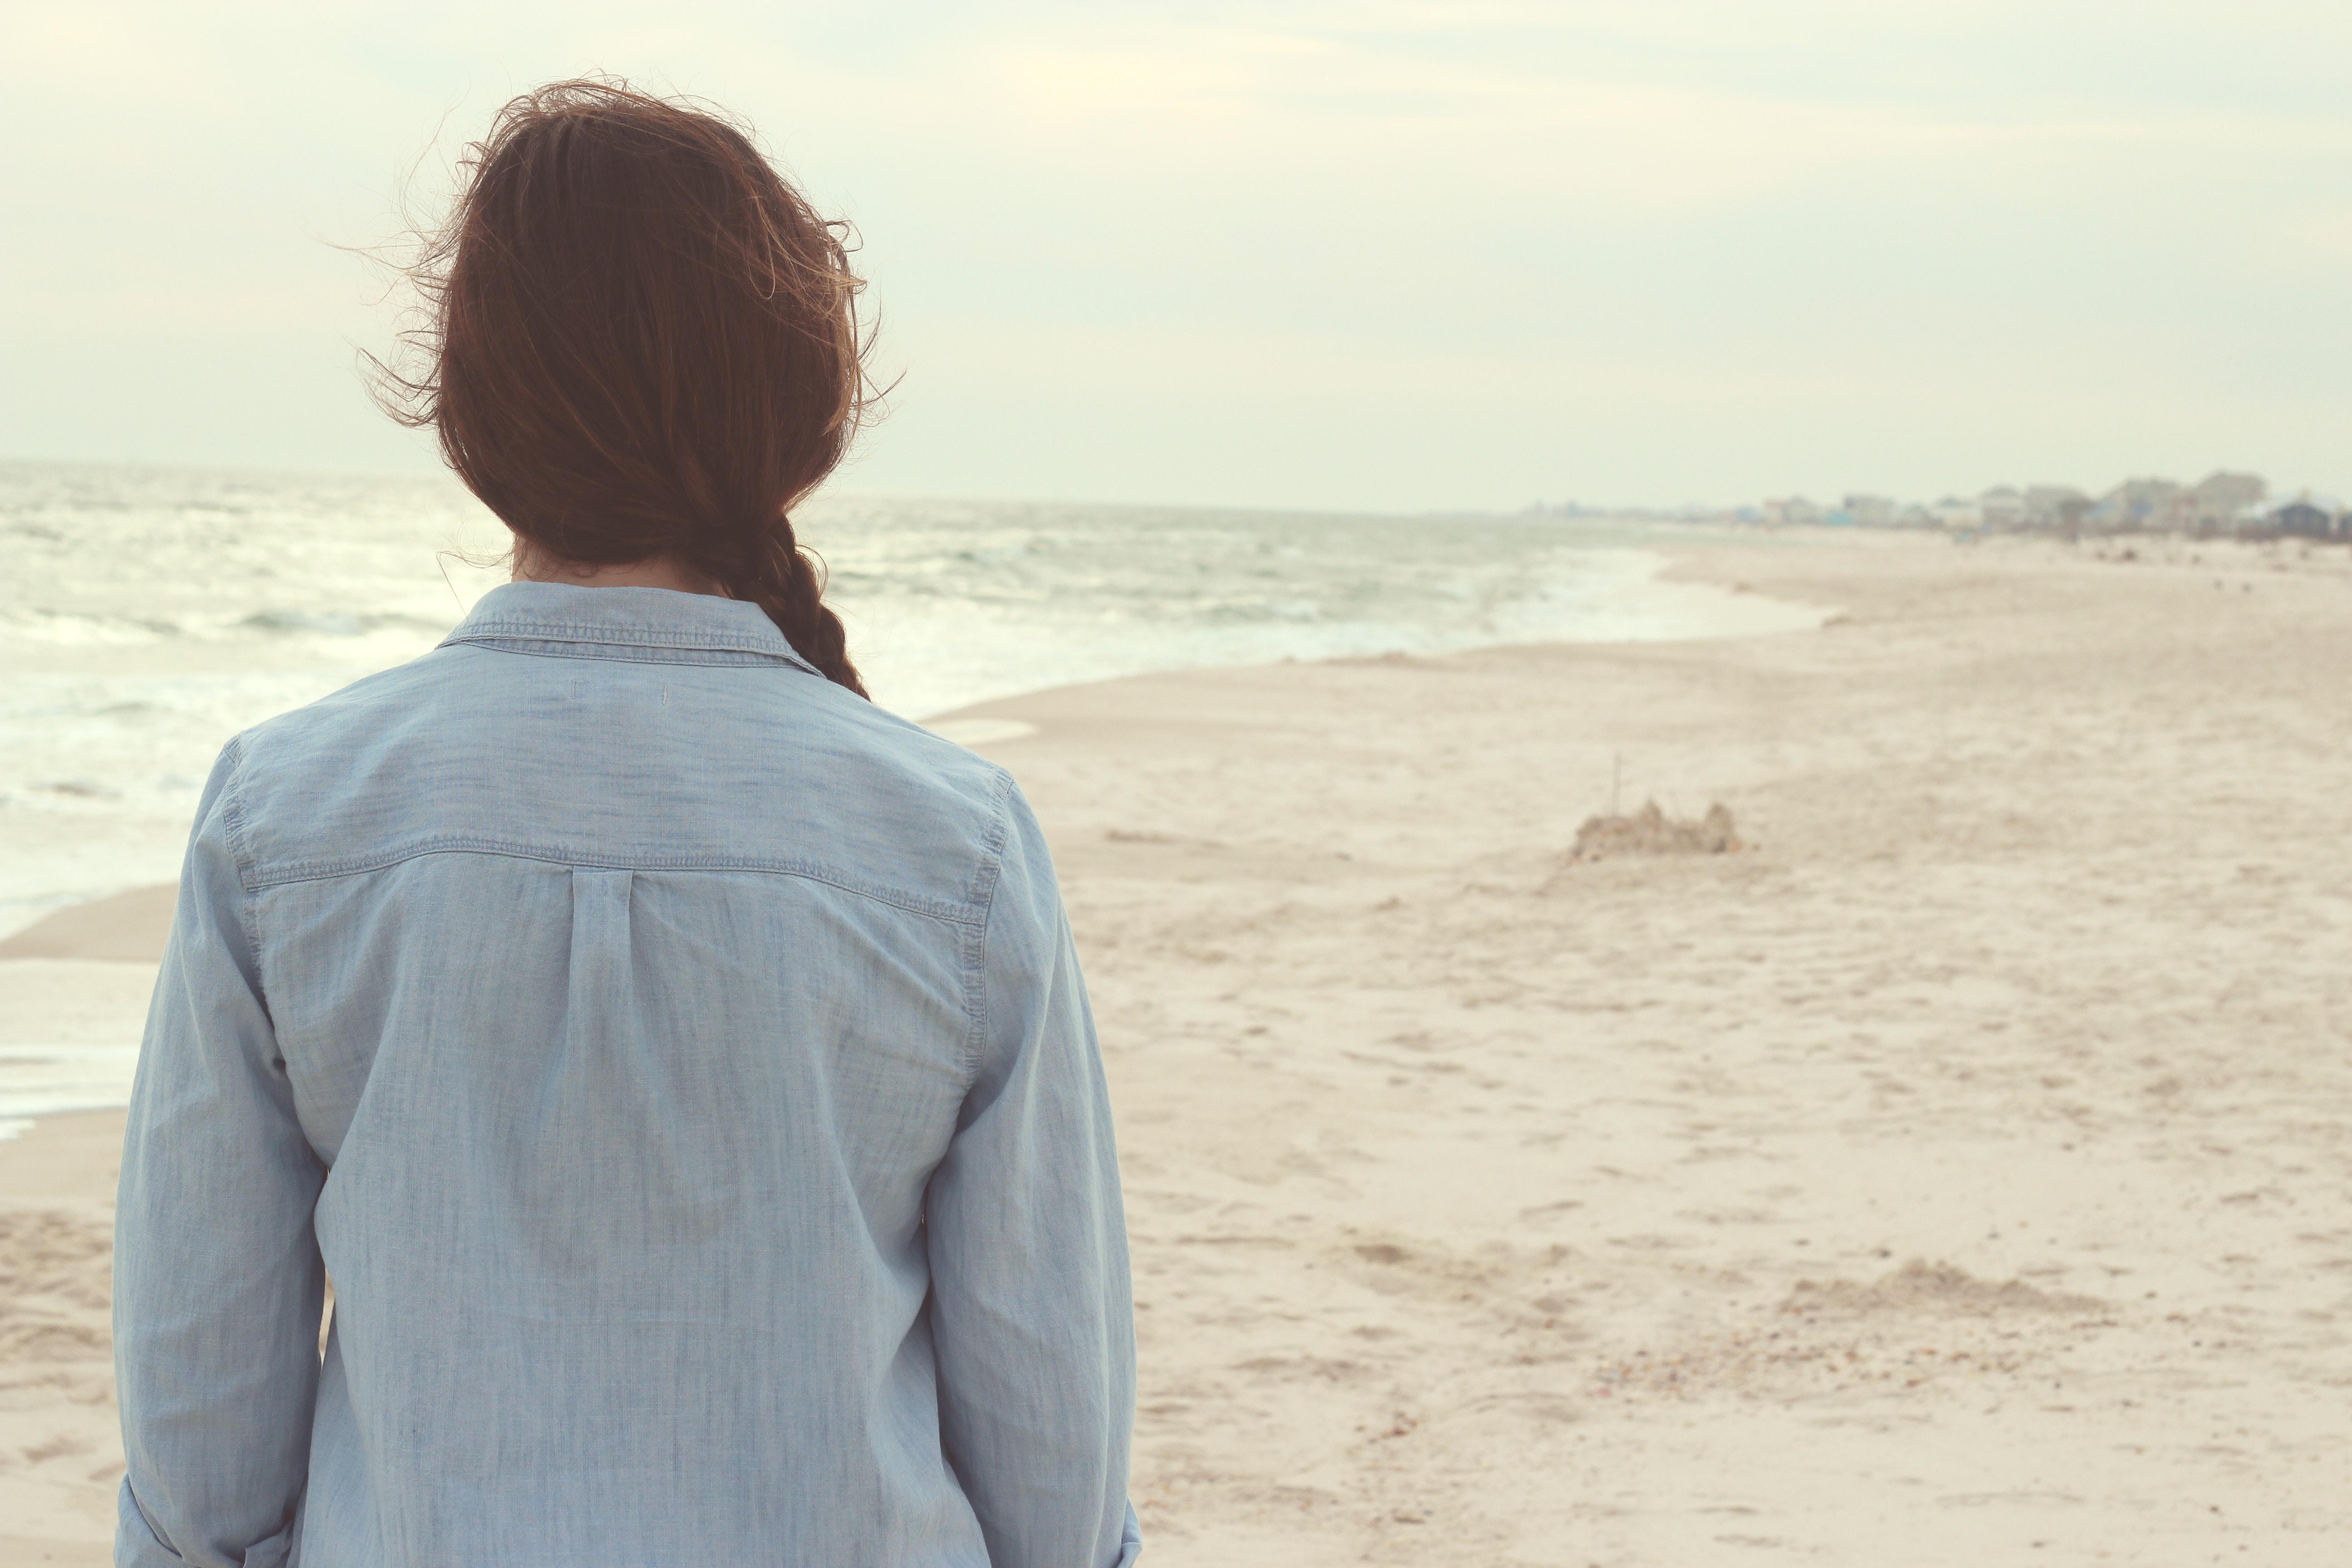 Dark-haired woman on sandy beach